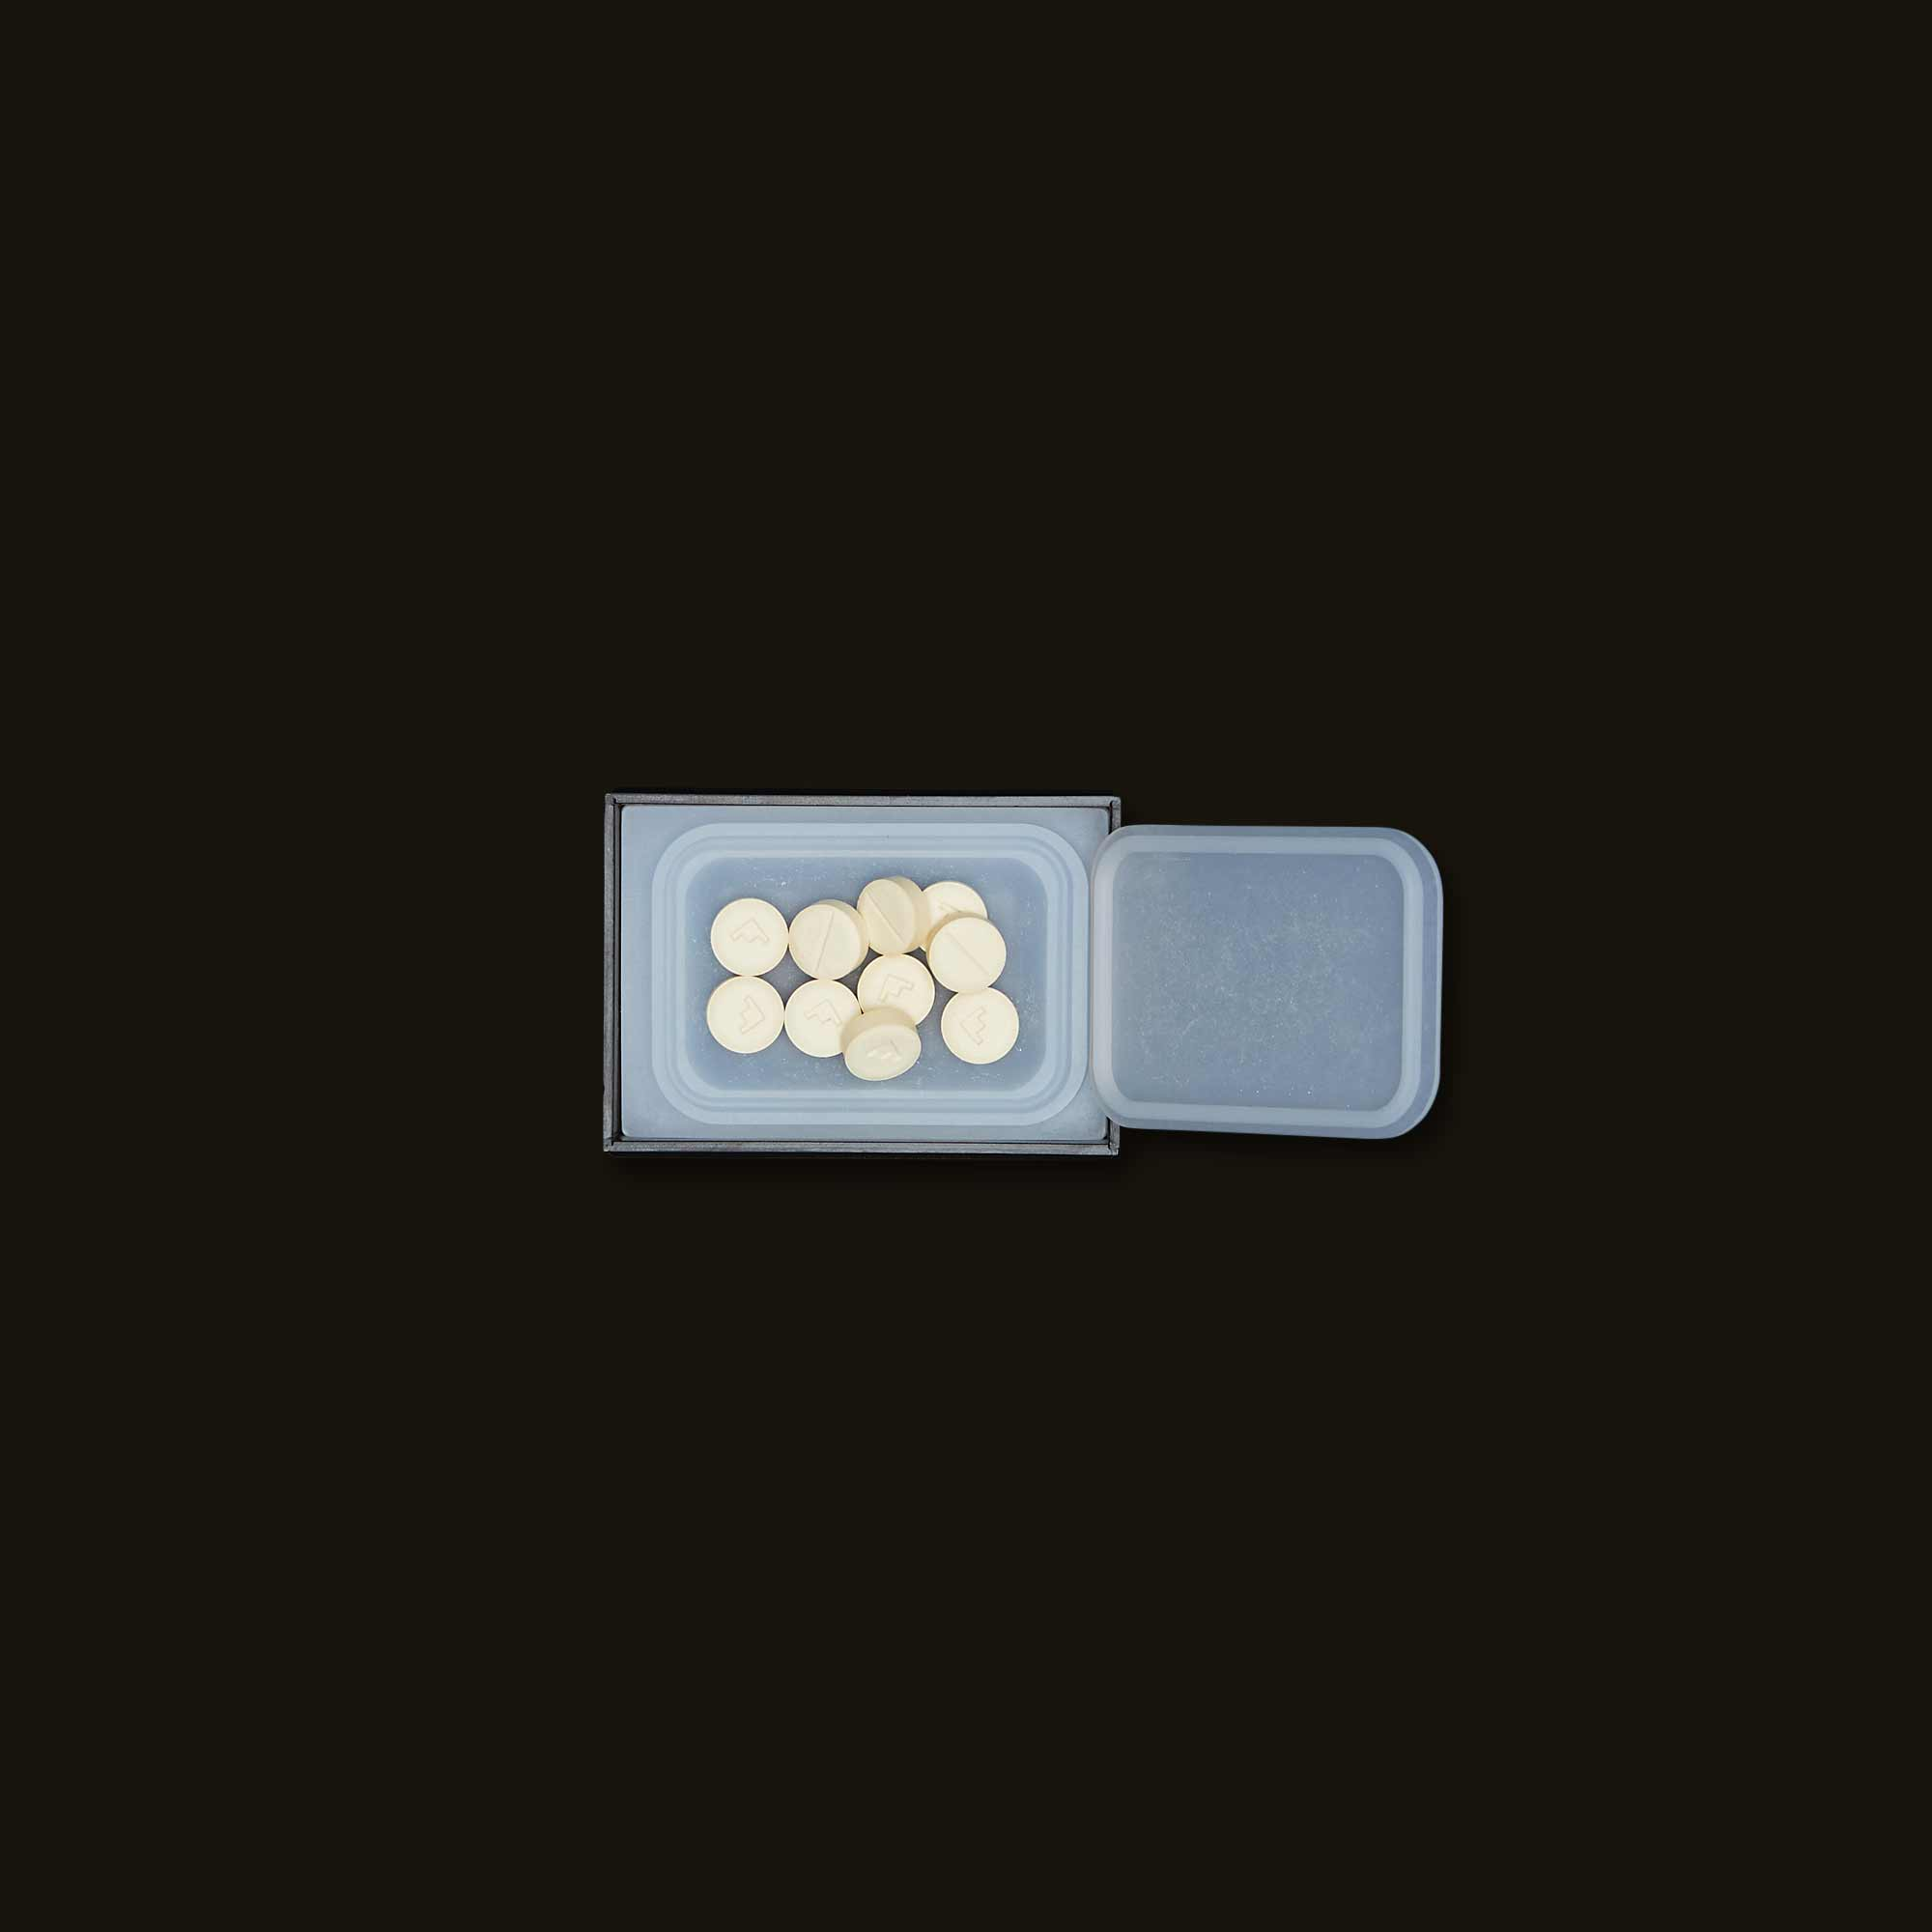 Container of Protab CBD Soft Gel Pills